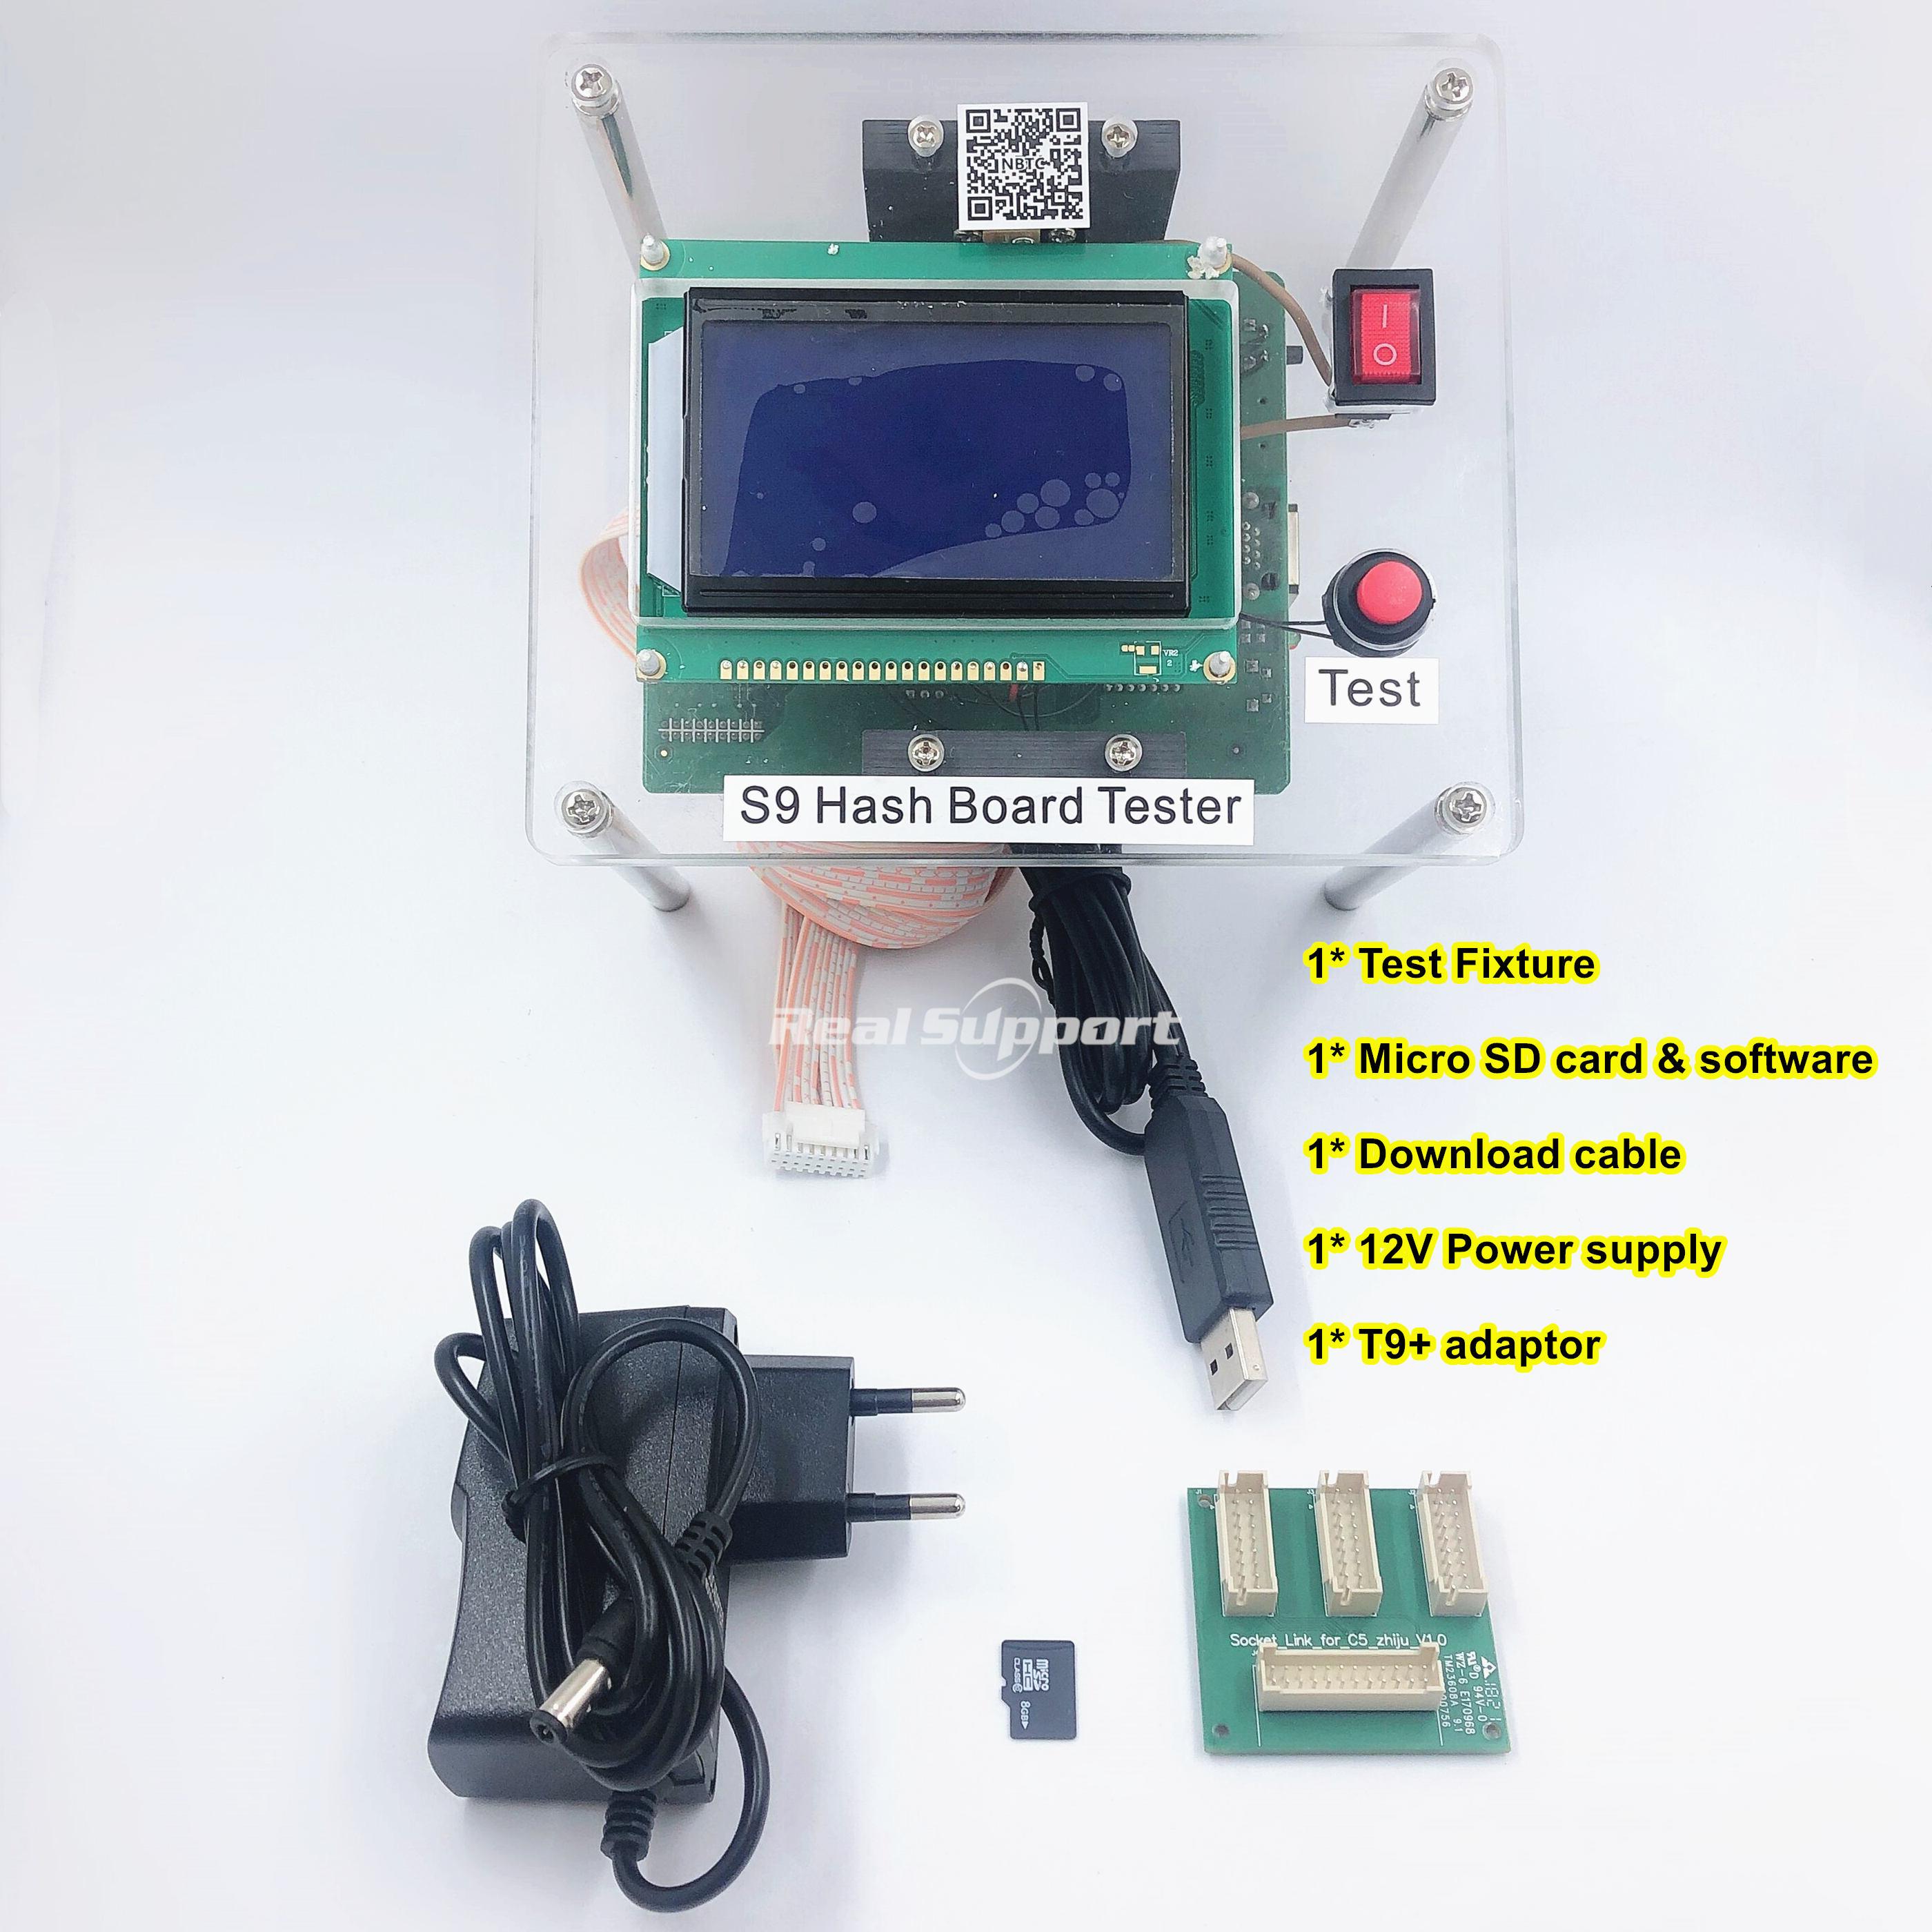 Image 3 - Bitcoin BTC Miner Test Fixture S9 S9i S9j T9 T9+ S9K / S9 SE hash board tester repair chip BM1387 BM1387BReplacement Parts & Accessories   -